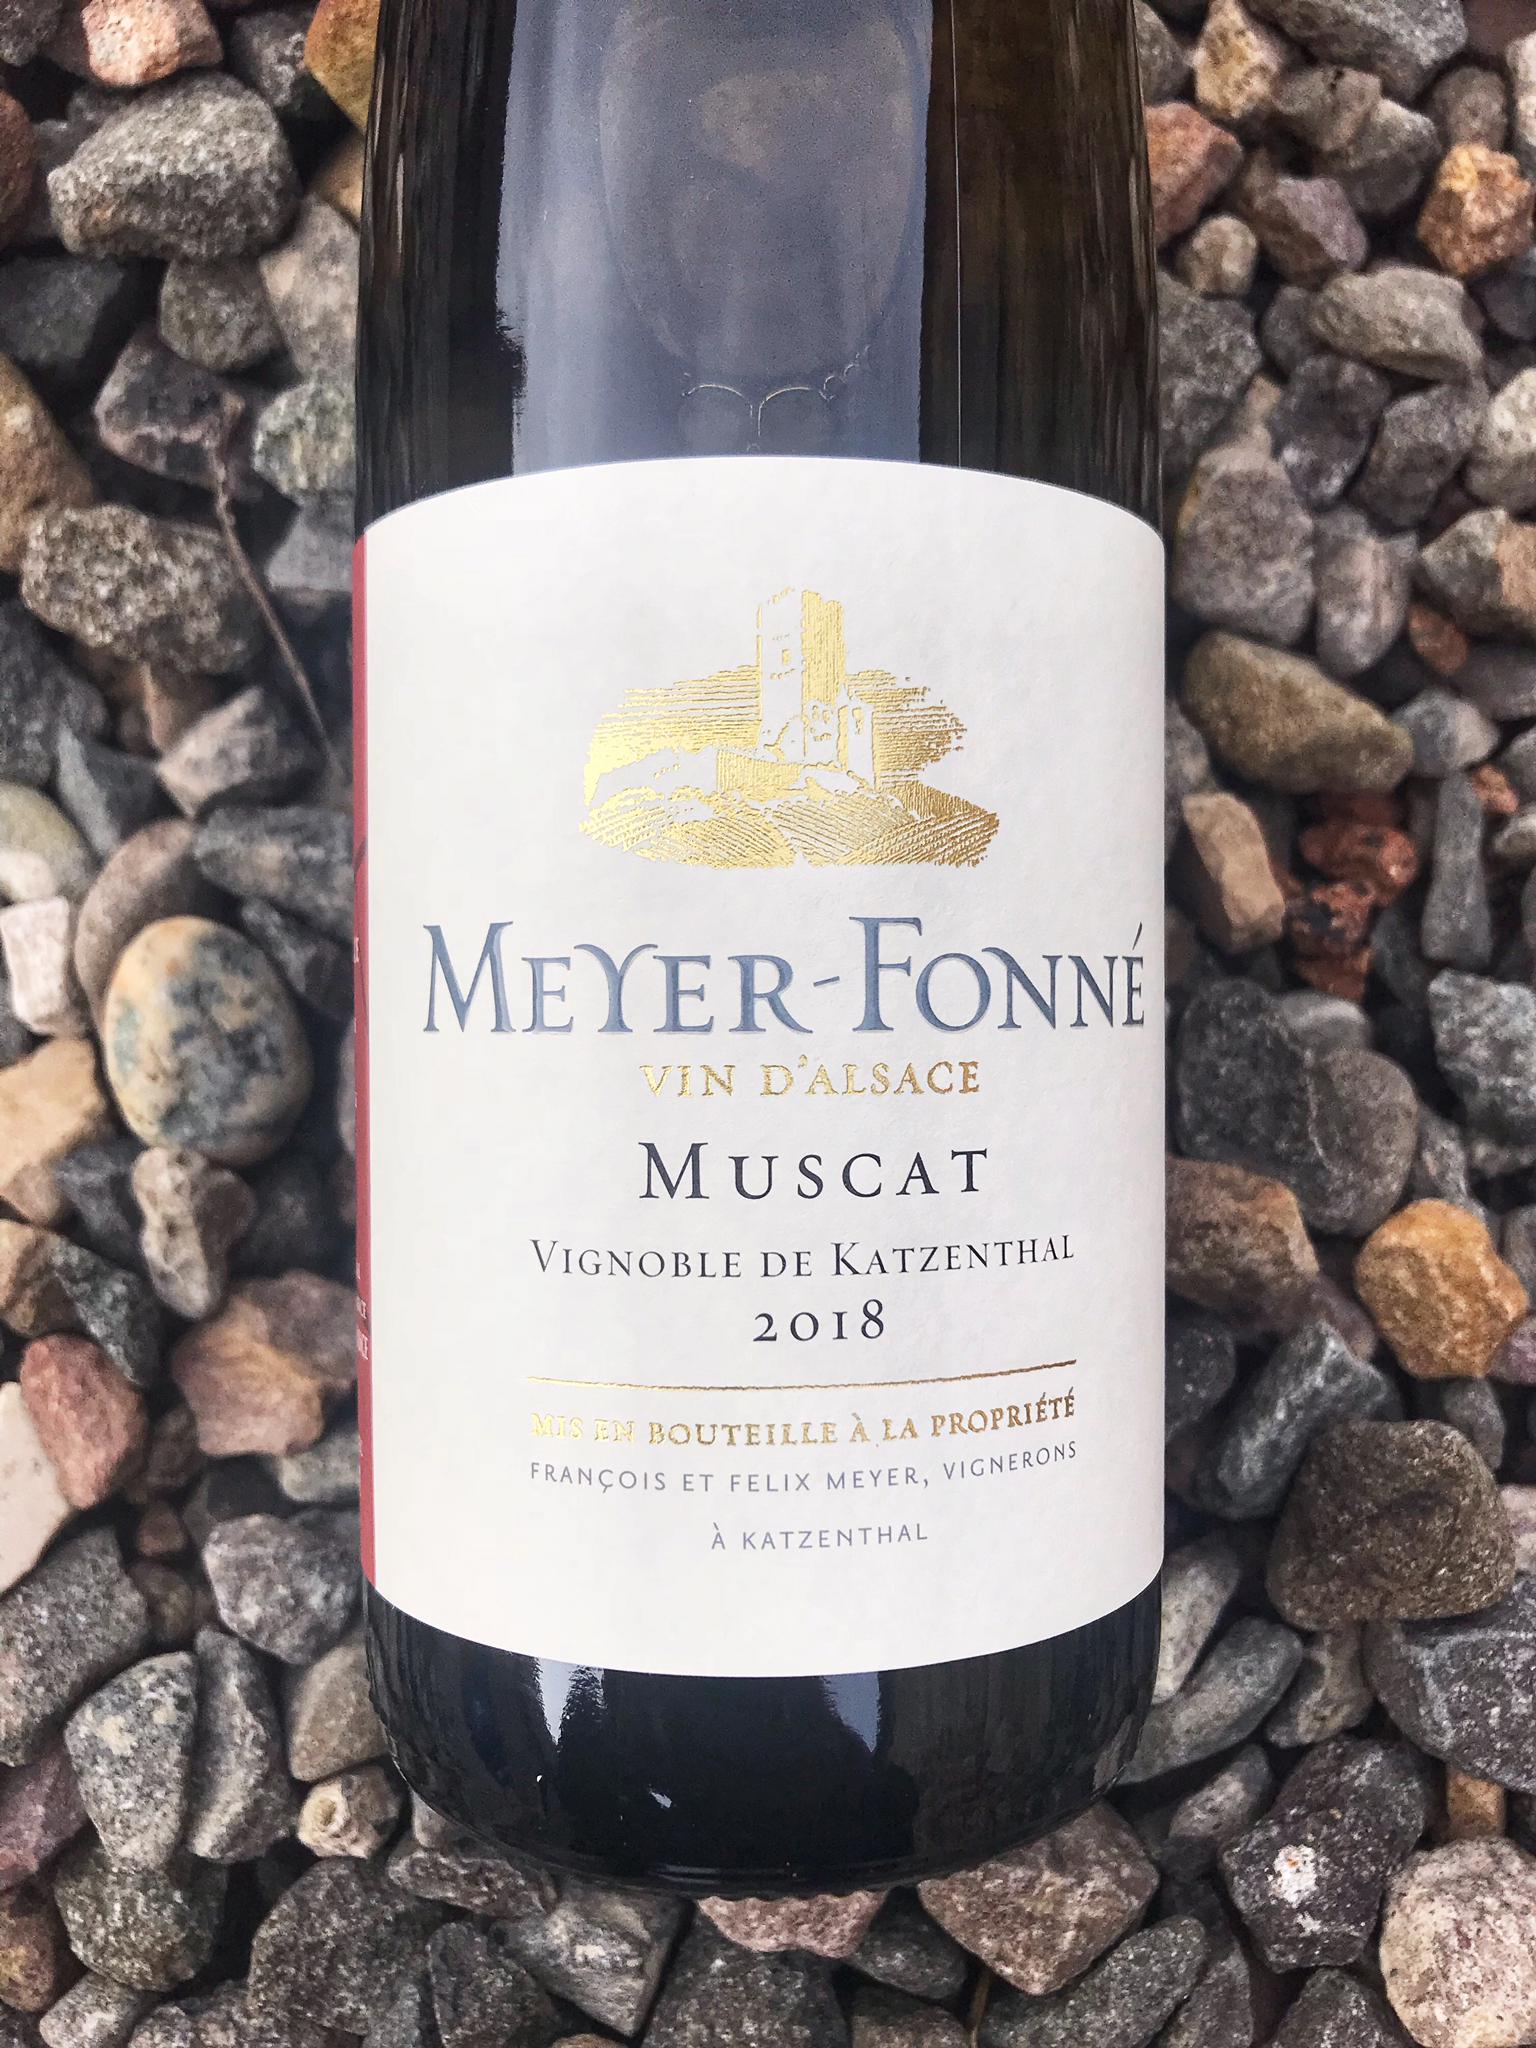 Meyer Fonne Muscat Vignoble de Katzenthal 2018 00241